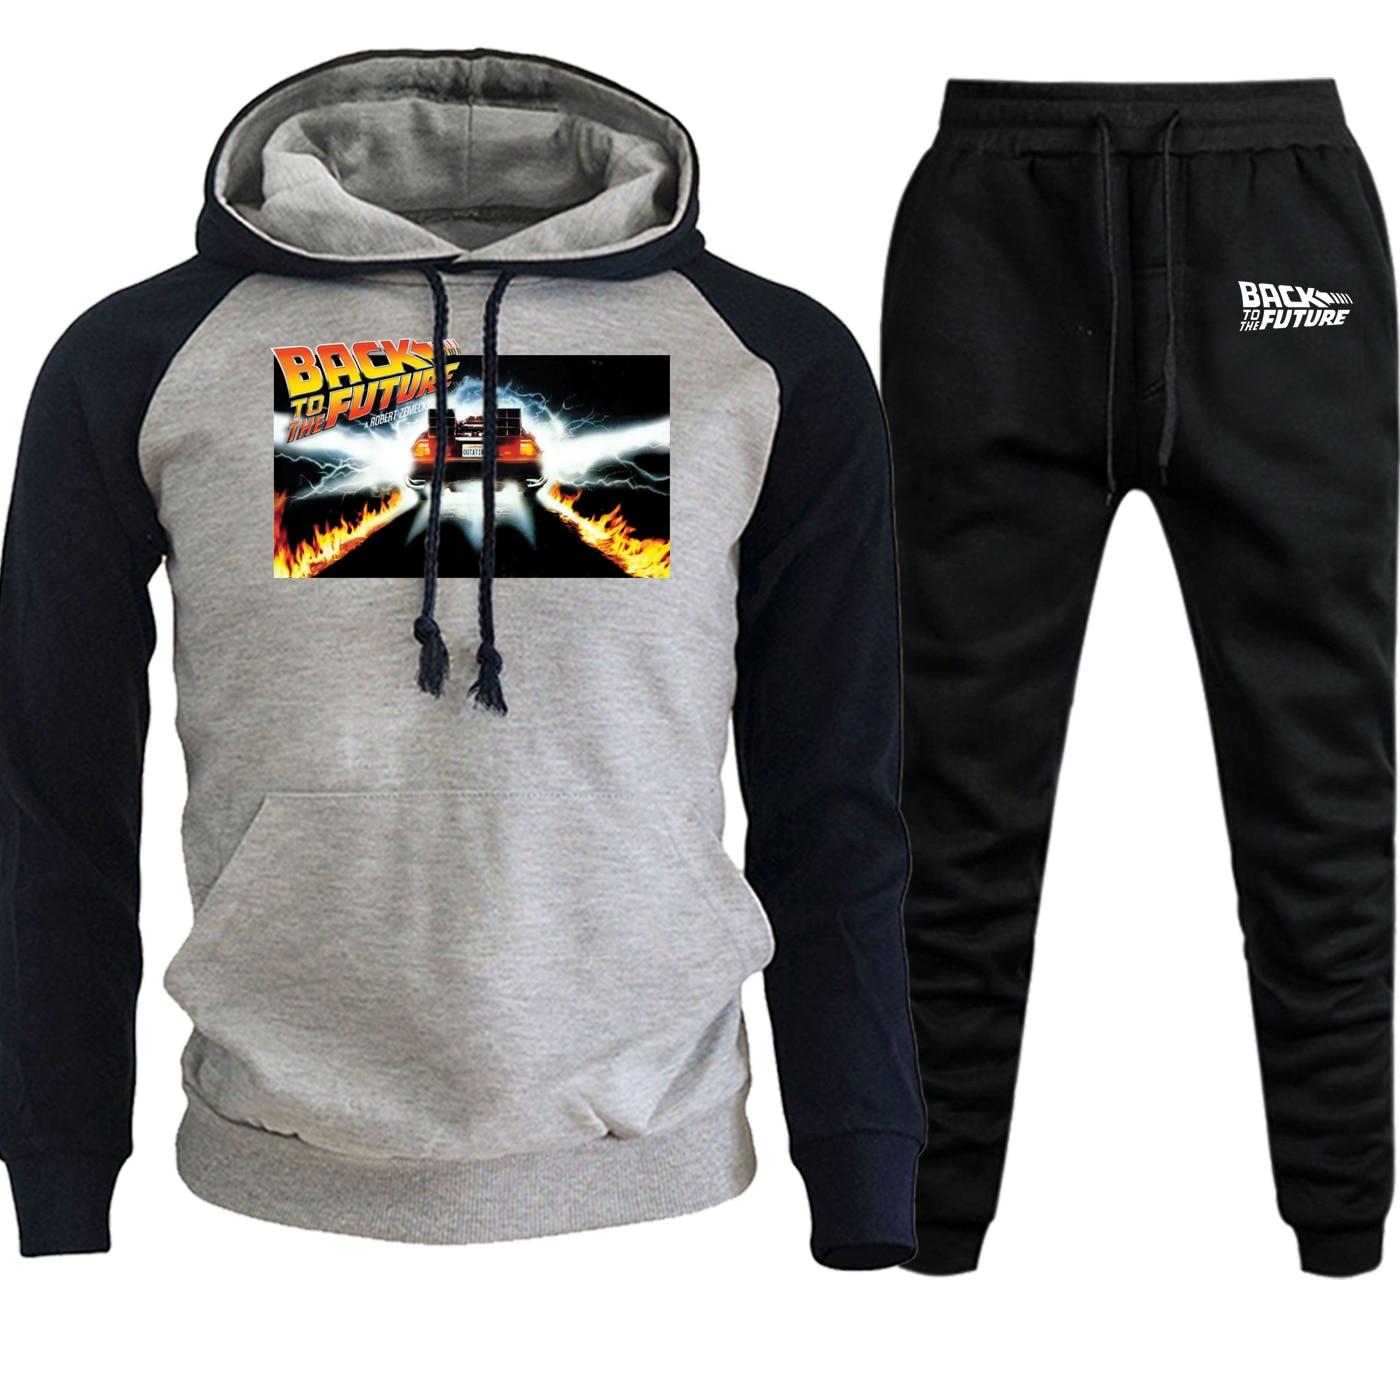 Back To The Future 2 Autumn Winter New Hoodies+Pants 2 Piece Set Funny Streetwear Men Raglan Casual Fleece Suit Male Sweatshirts